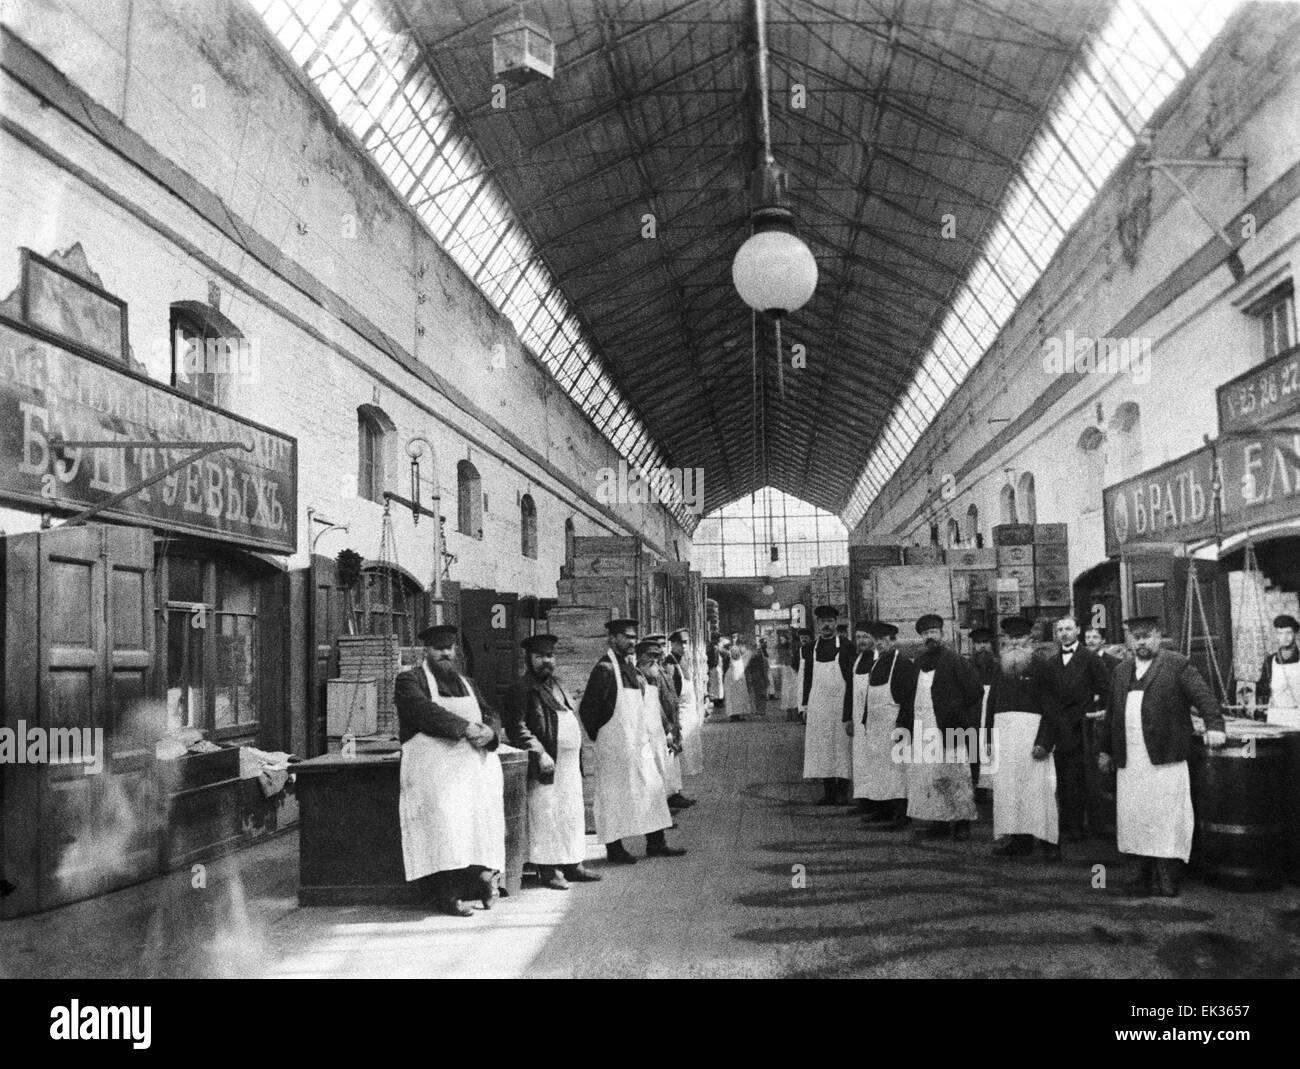 Russian merchants' warehouses and shops. - Stock Image